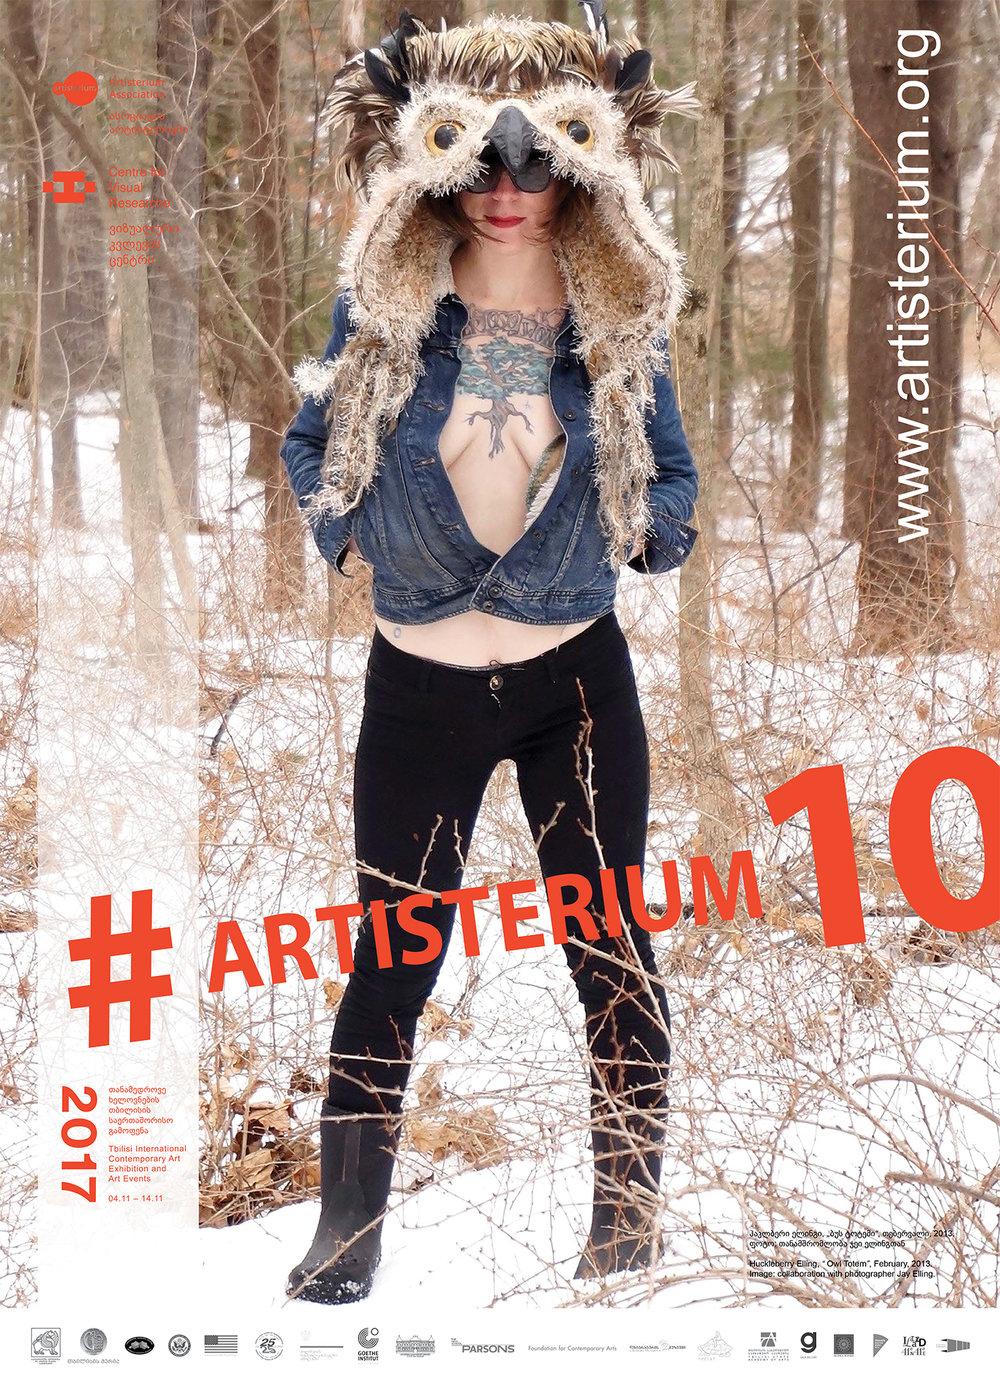 Poster_Artisterium 10 2017.jpg